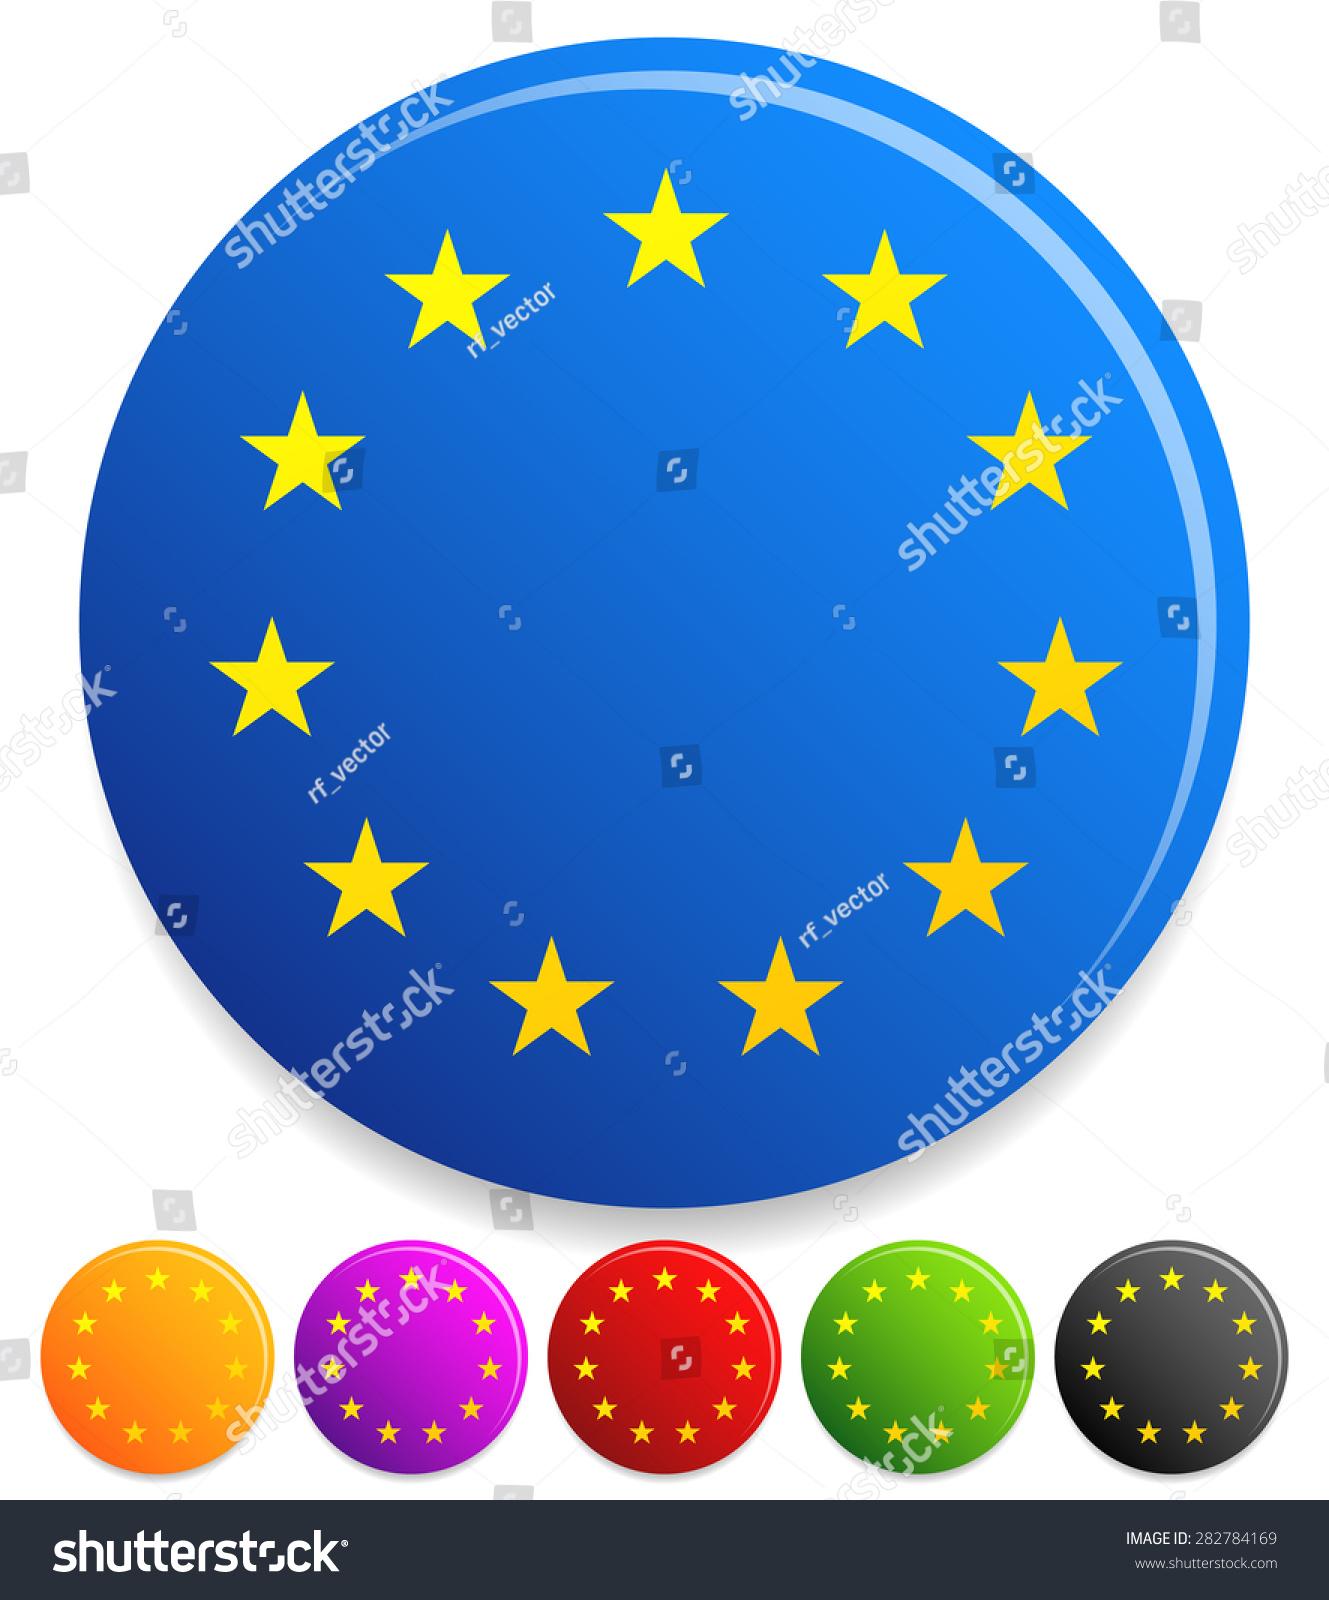 12 Stars Circle Award Prize Certification Stock Vector Royalty Free